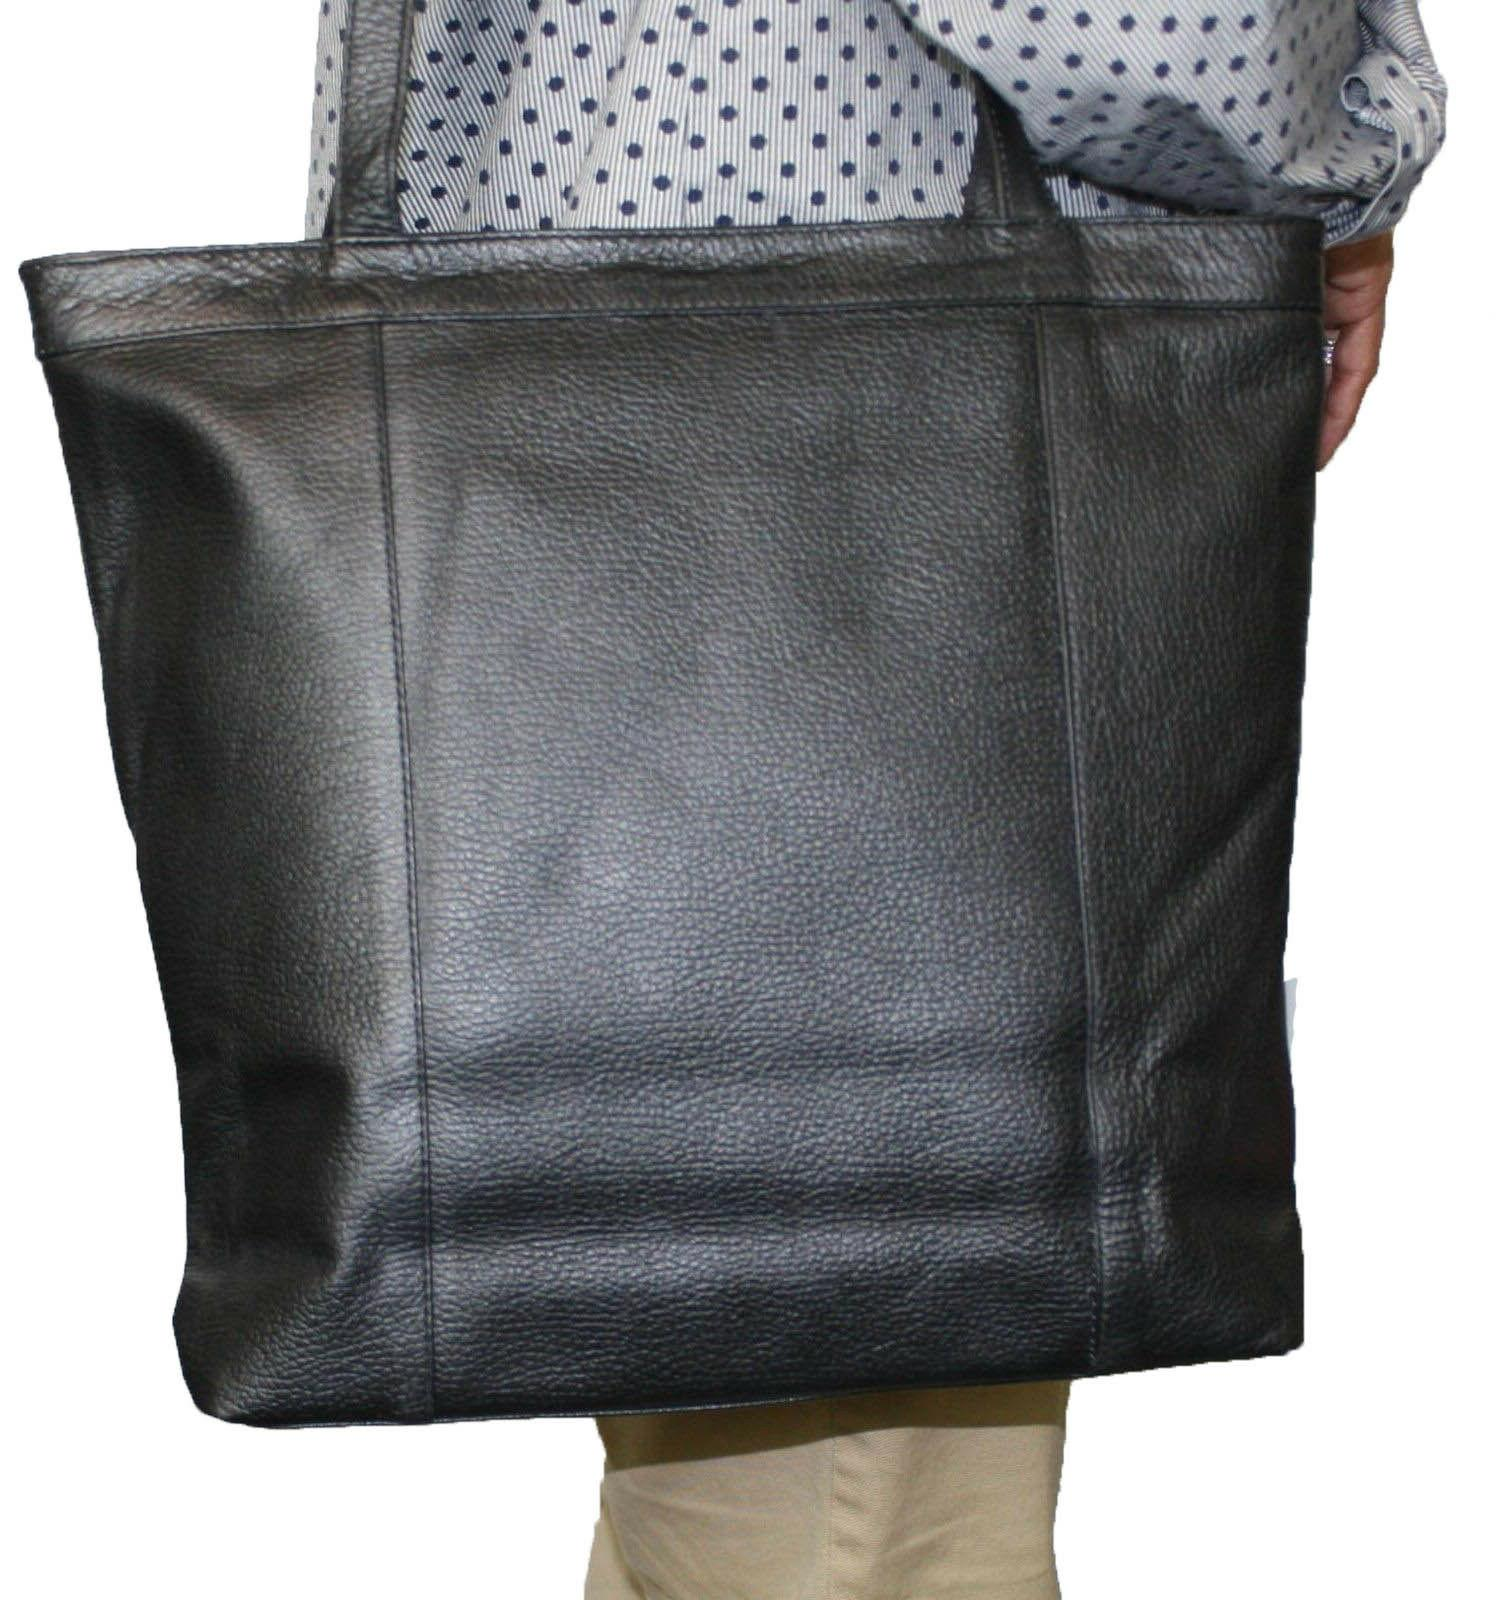 Genuine Tote Large Women's Handbag Purse